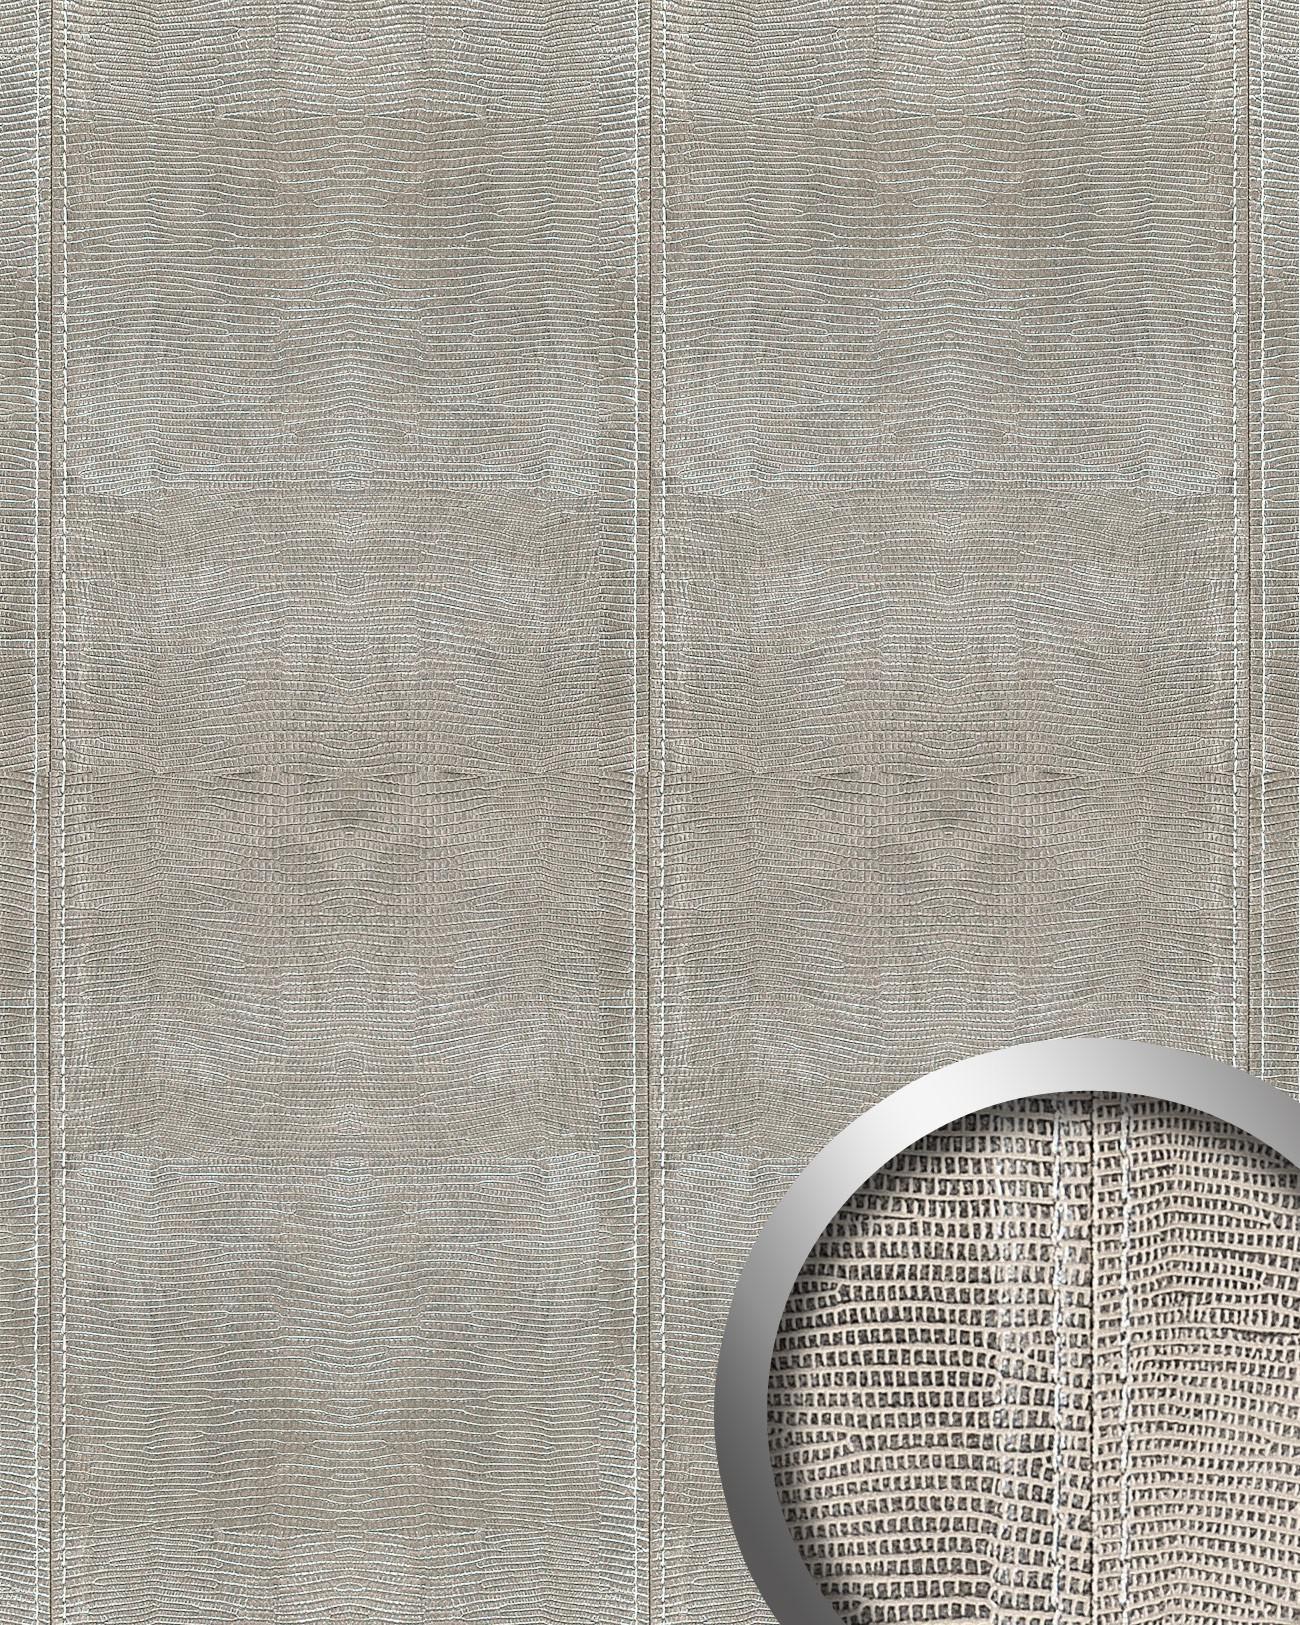 wandpaneel leder blickfang wallface 15006 leguan design dekor echtnaht selbstklebende tapete. Black Bedroom Furniture Sets. Home Design Ideas